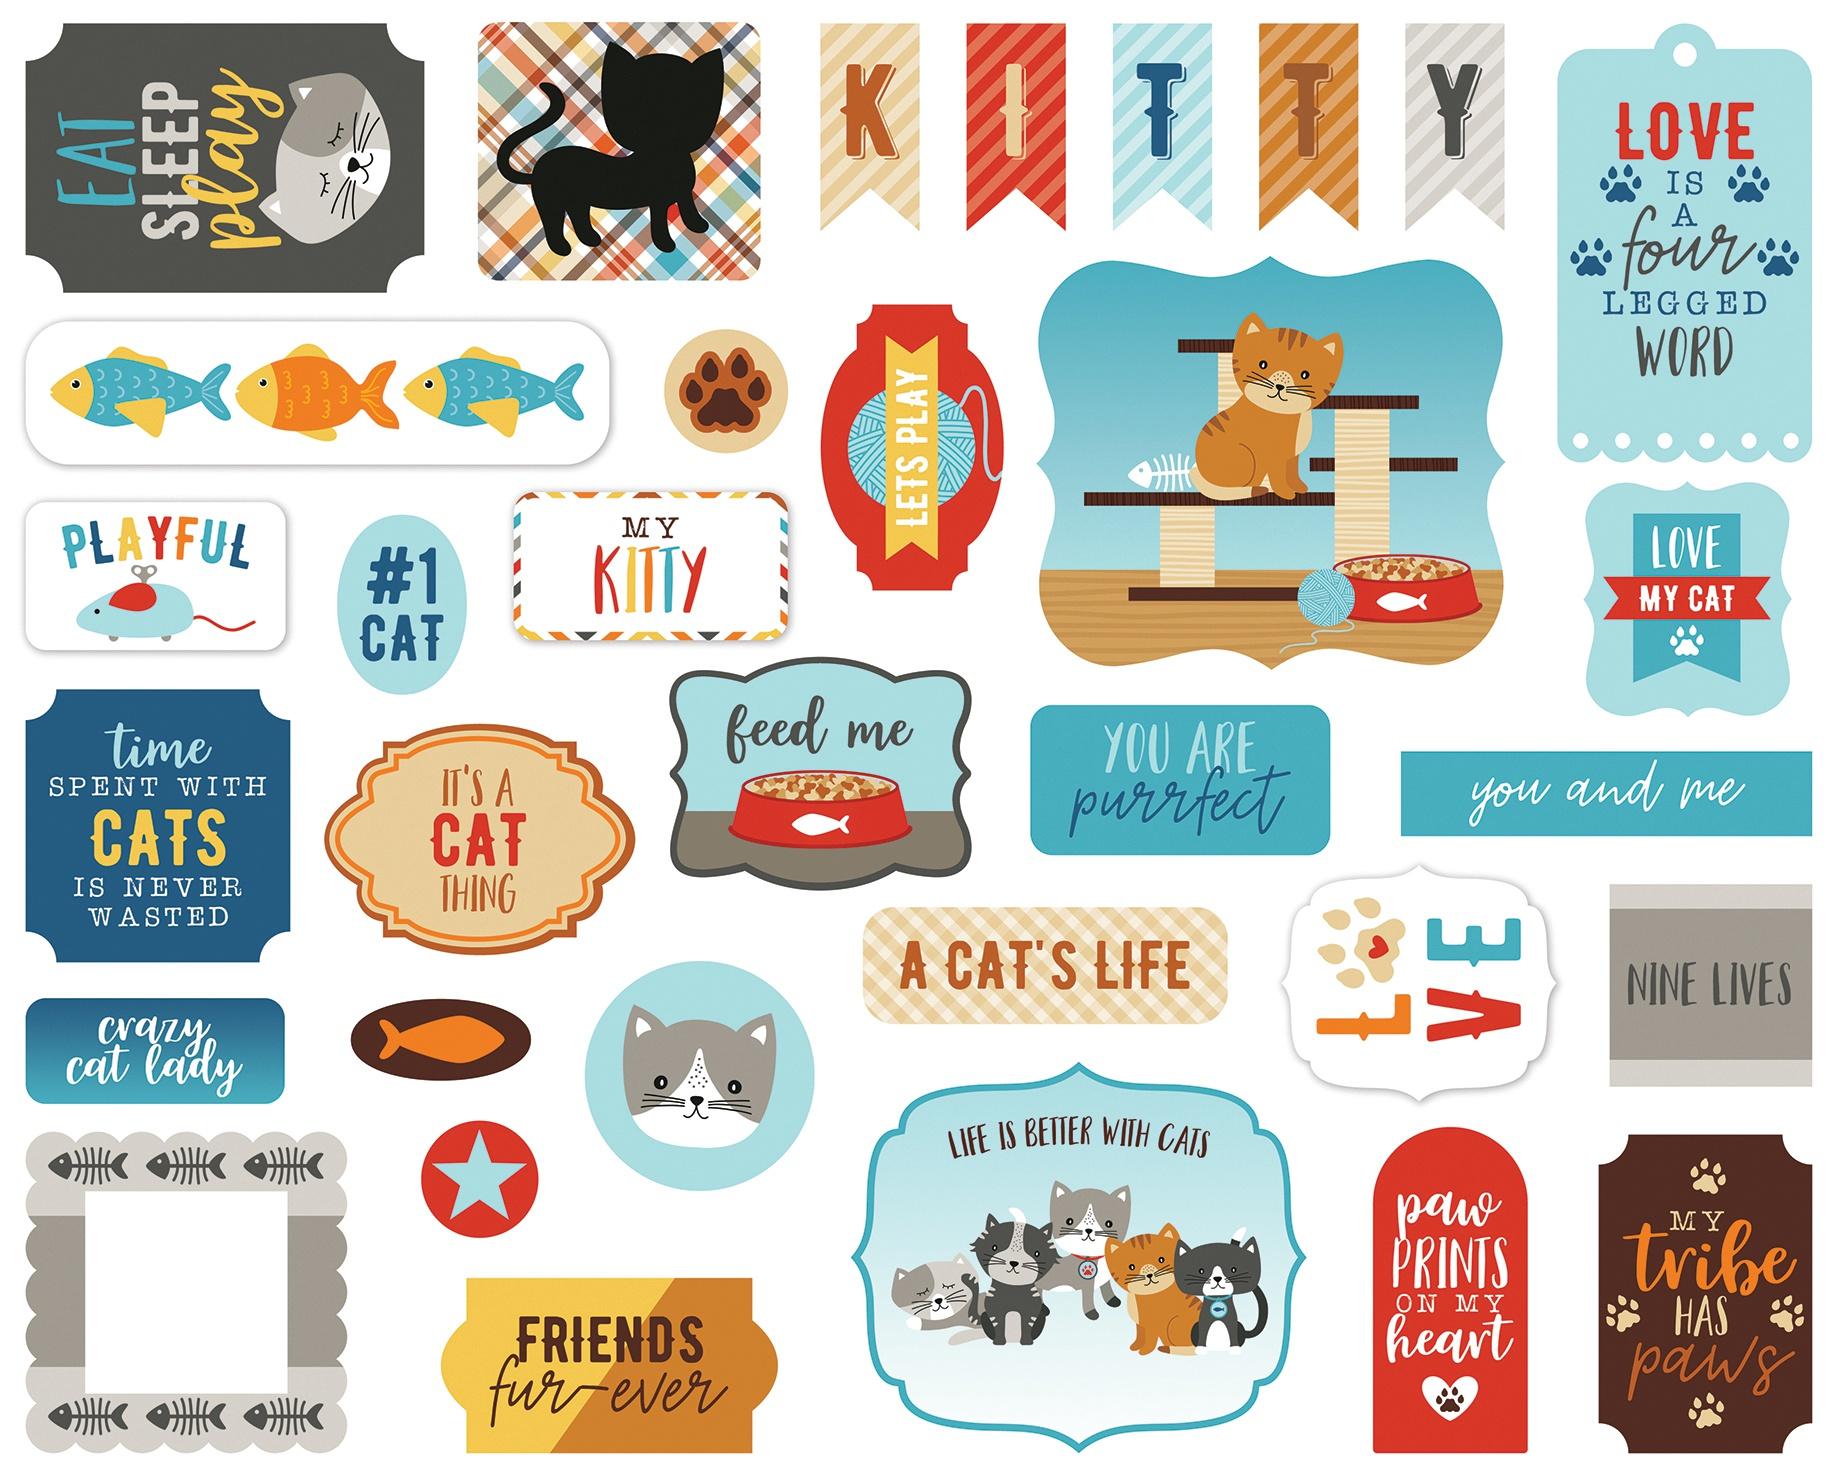 Echo Park Cardstock Ephemera 33/Pkg-Icons, I Love My Cat